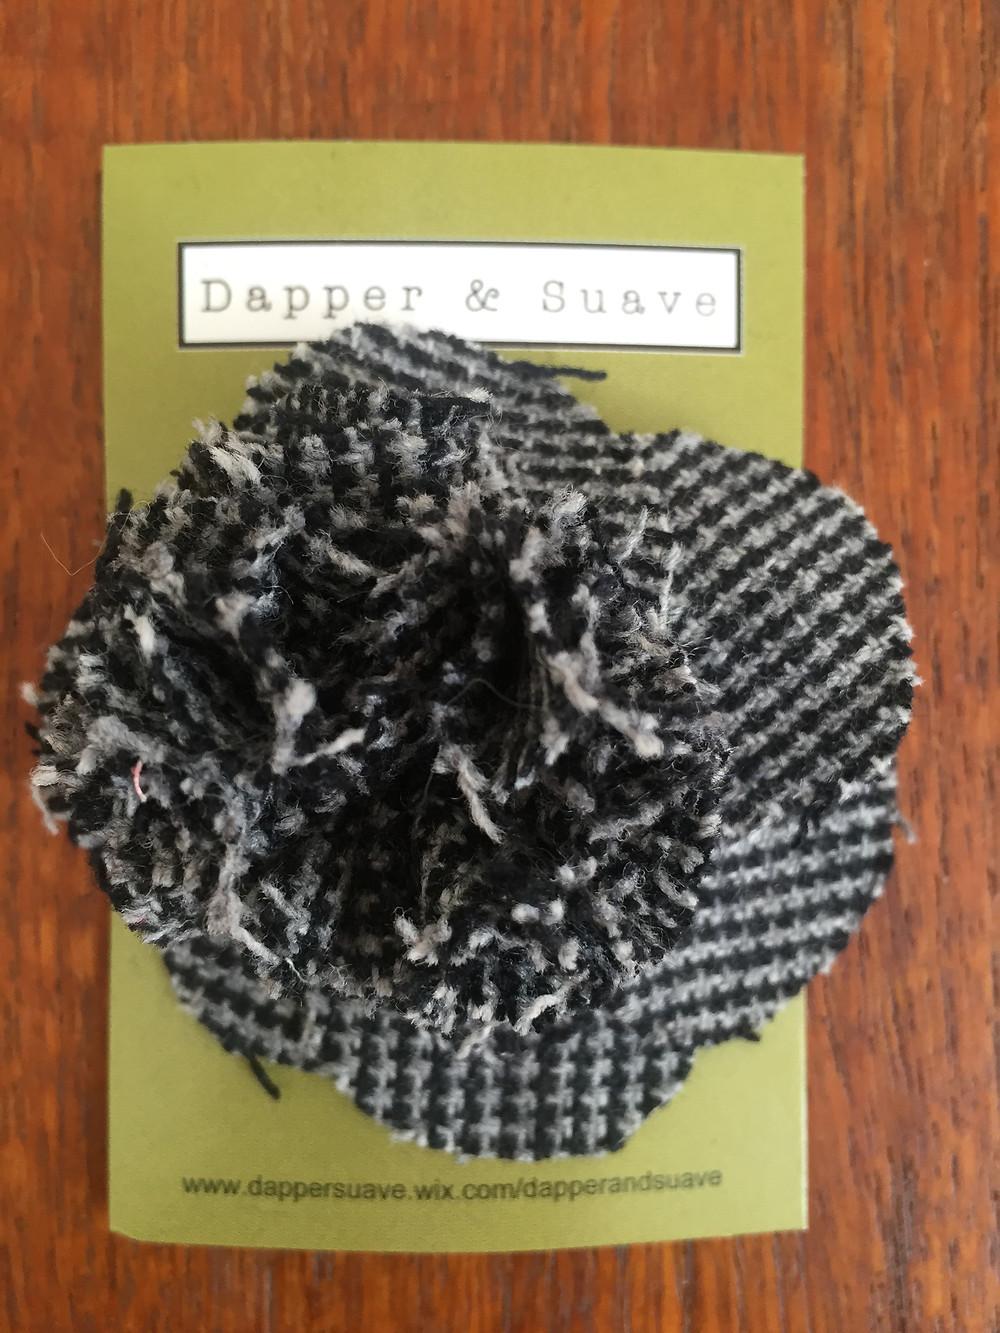 Dapper & Suave Large Black Tweed Lapel Pin